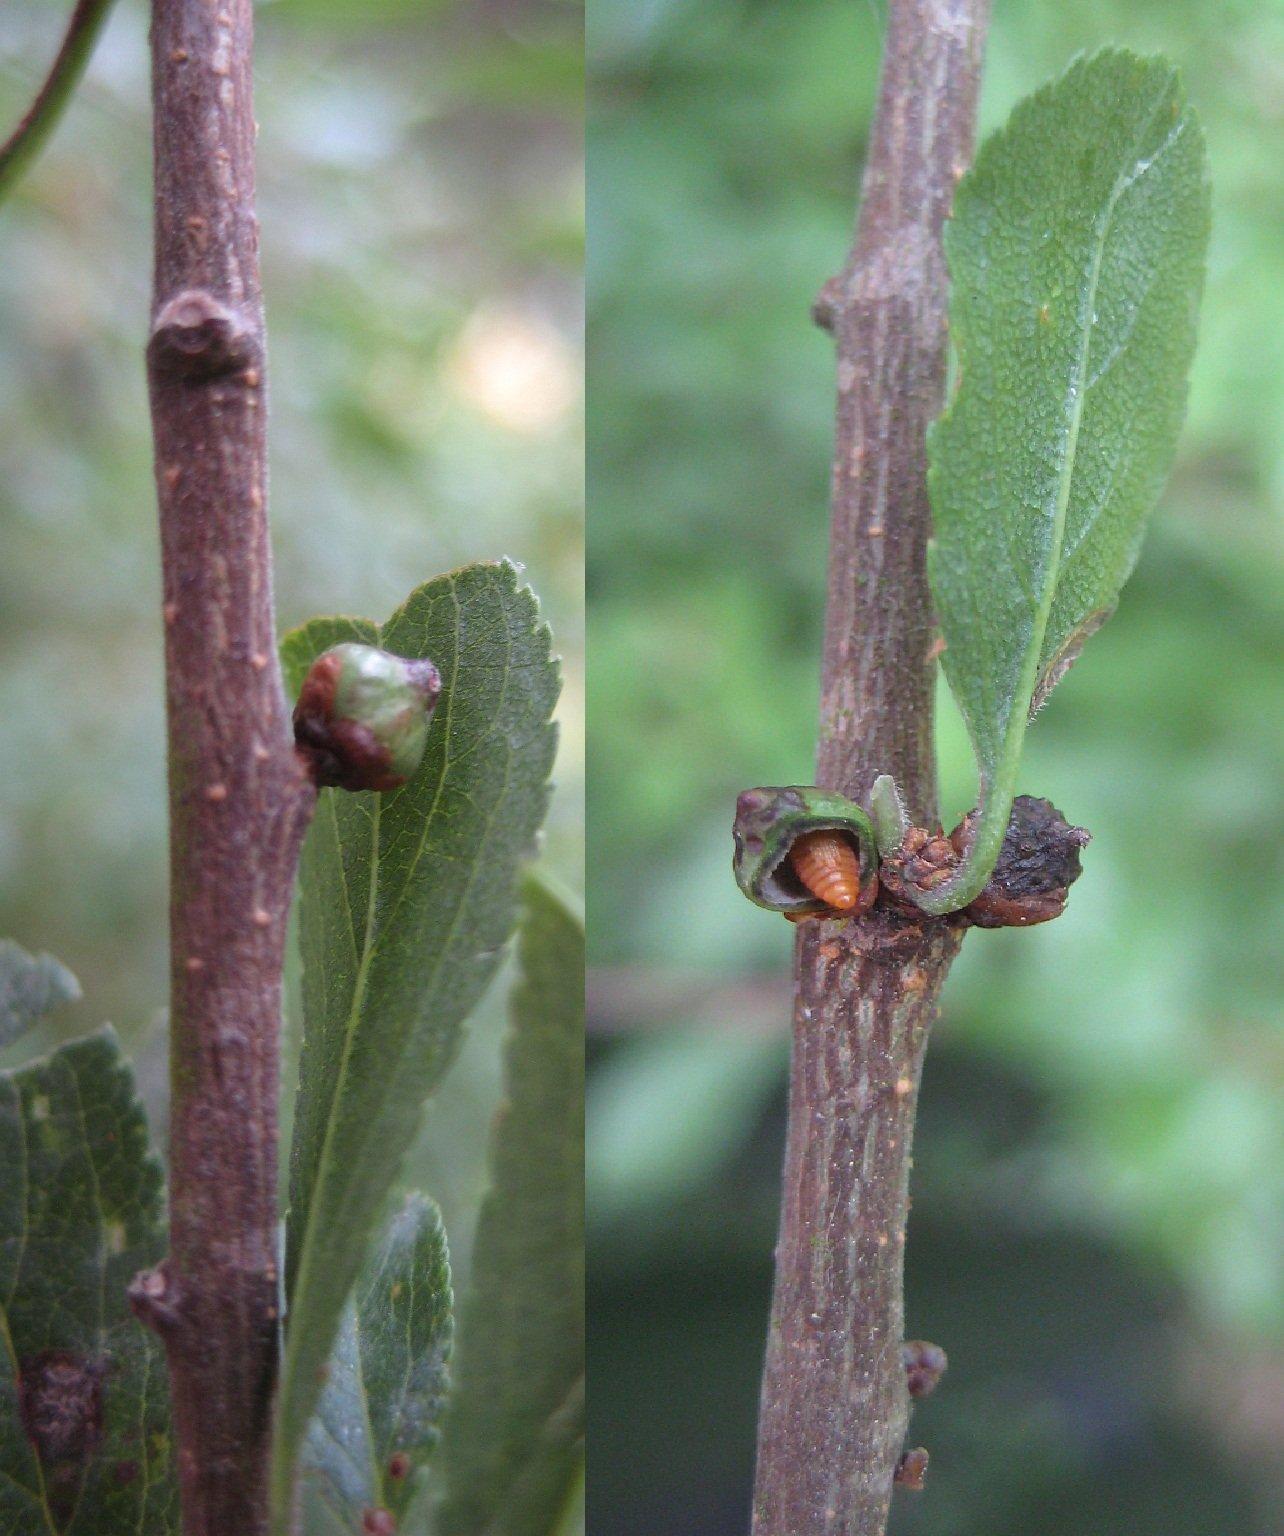 Asphondylia pruniperda